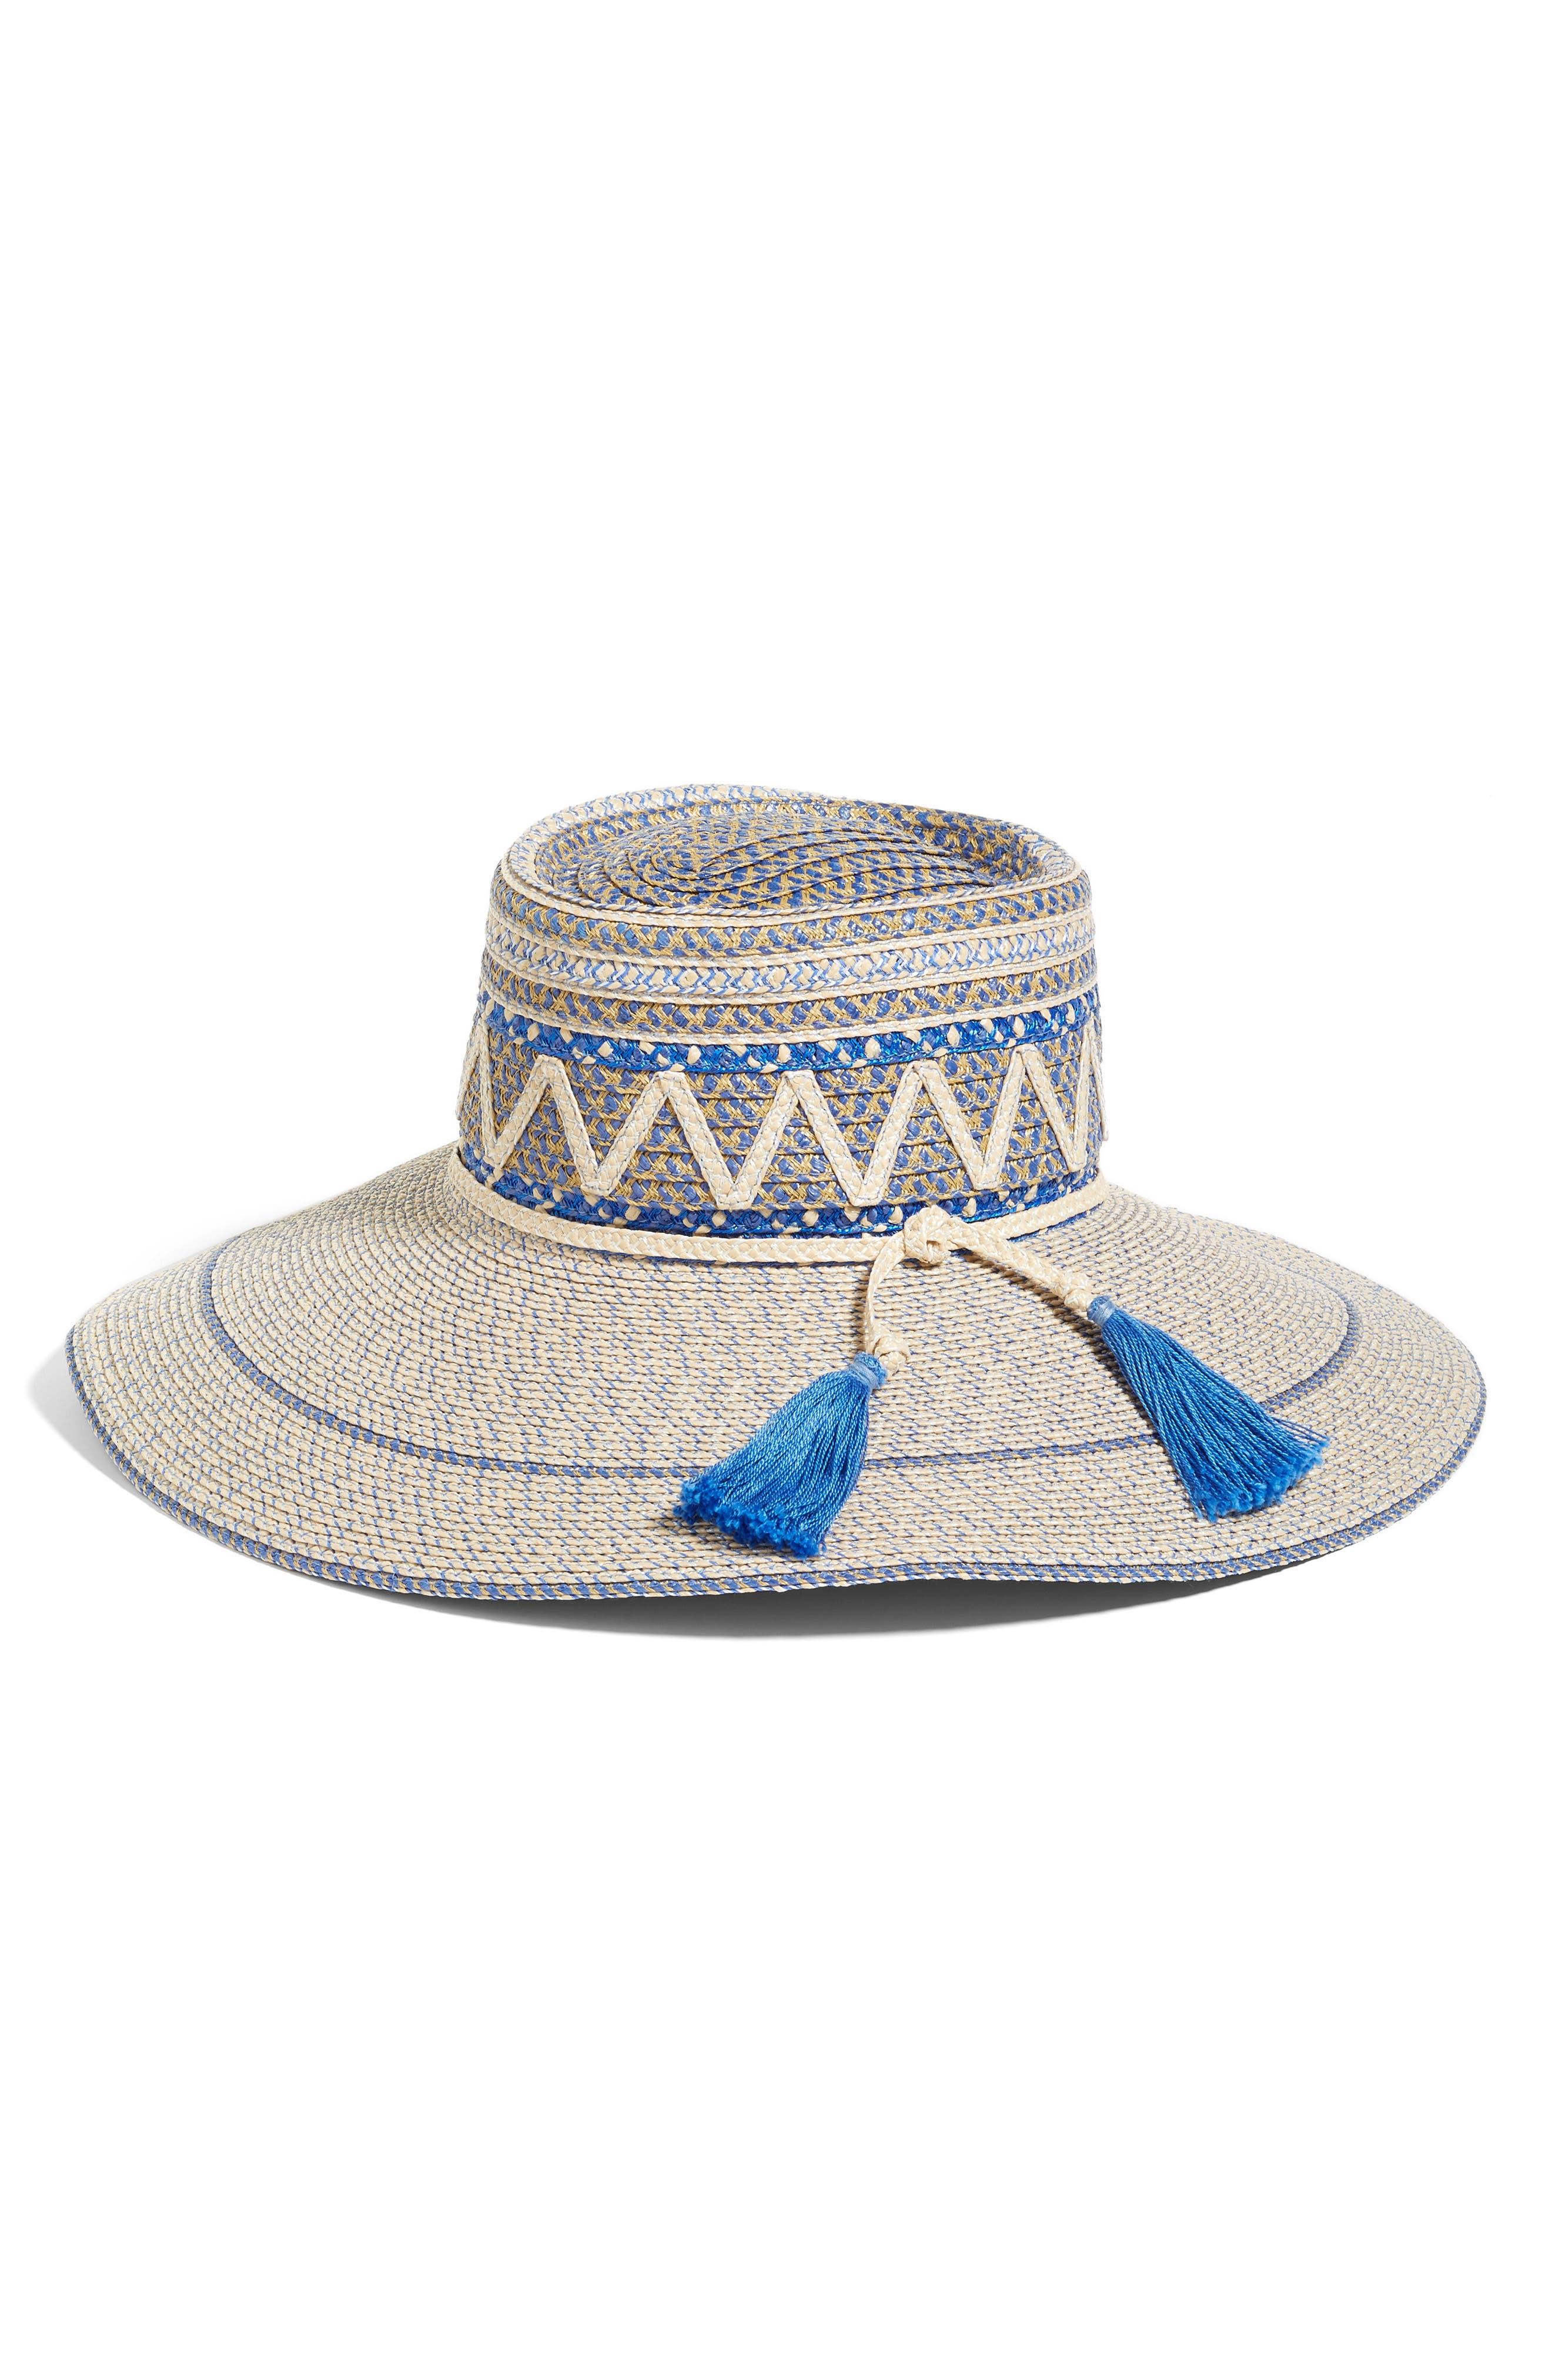 Main Image - Eric Javits Palermo Squishee® Wide Brim Hat